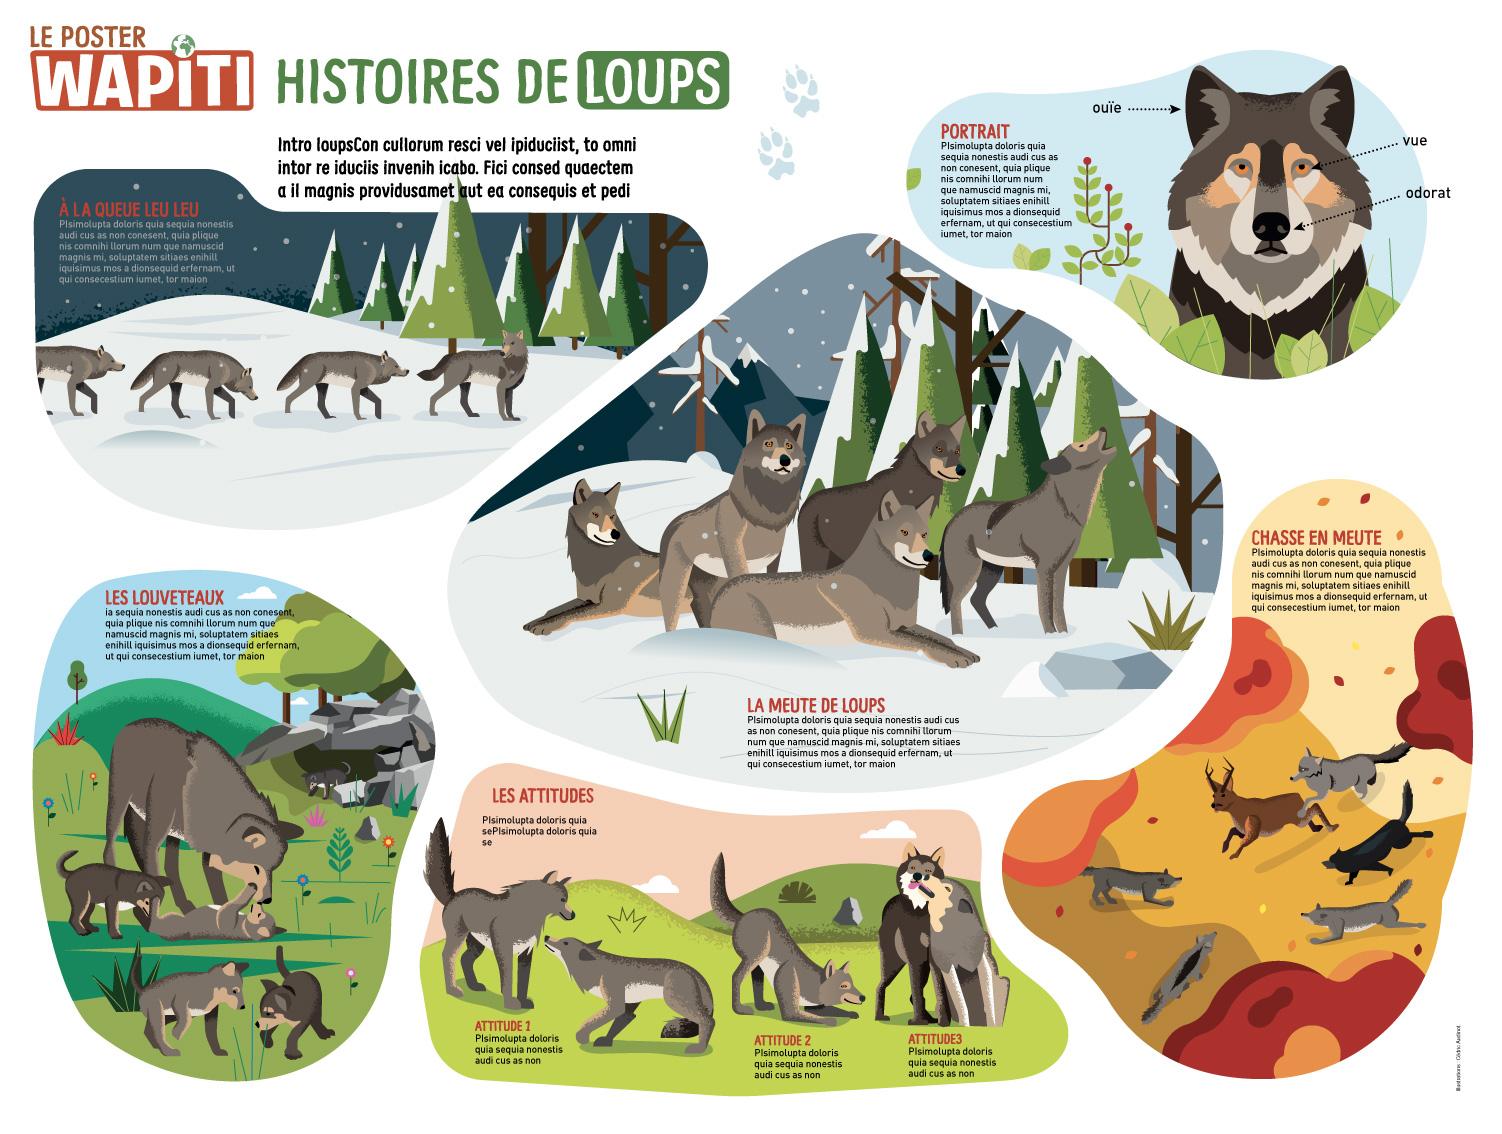 Poster : Histoire de loups, Wapiti.